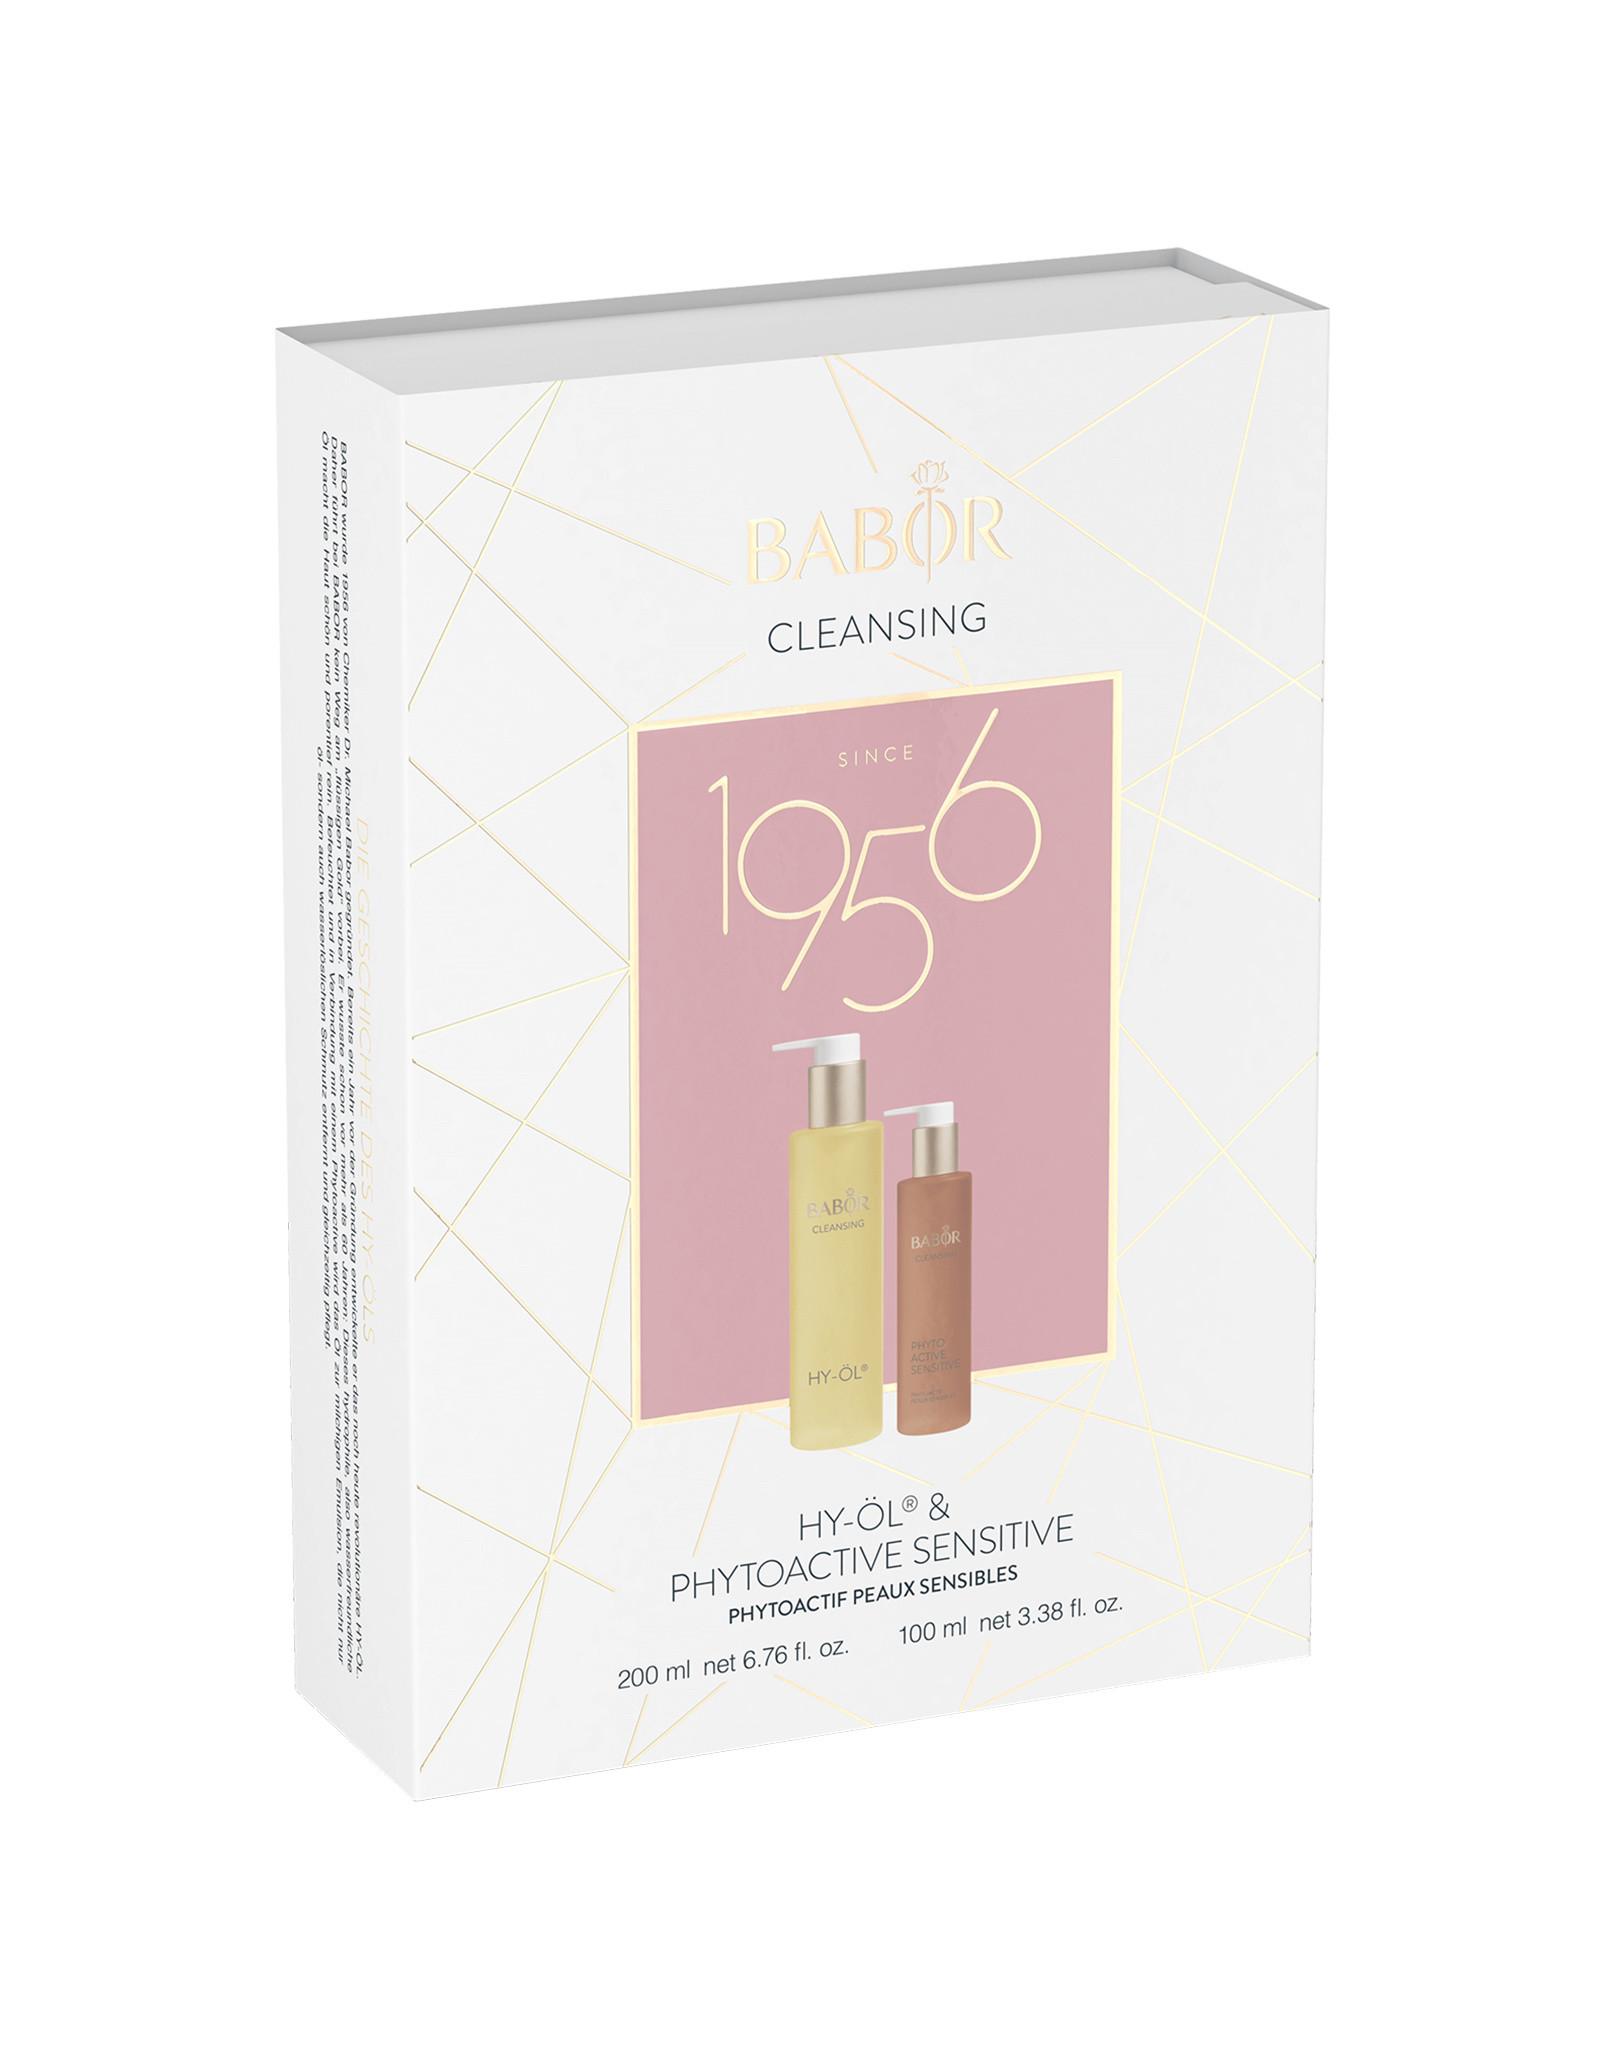 BABOR CLEANSING PROMOSET HY-ÖL & SENSITIVE 2021 2 SET